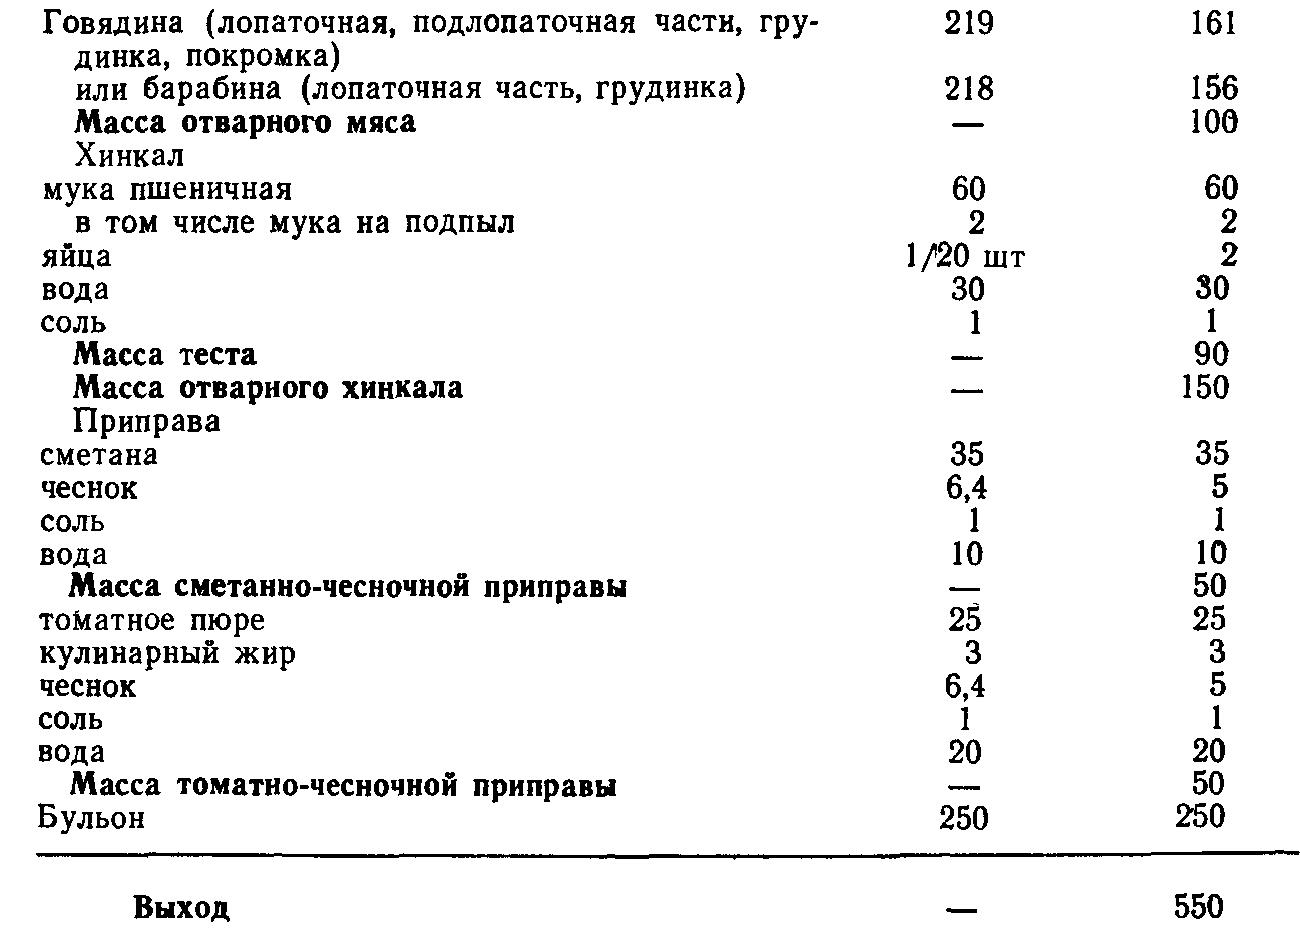 Суп Хинкал (ТТК5520)